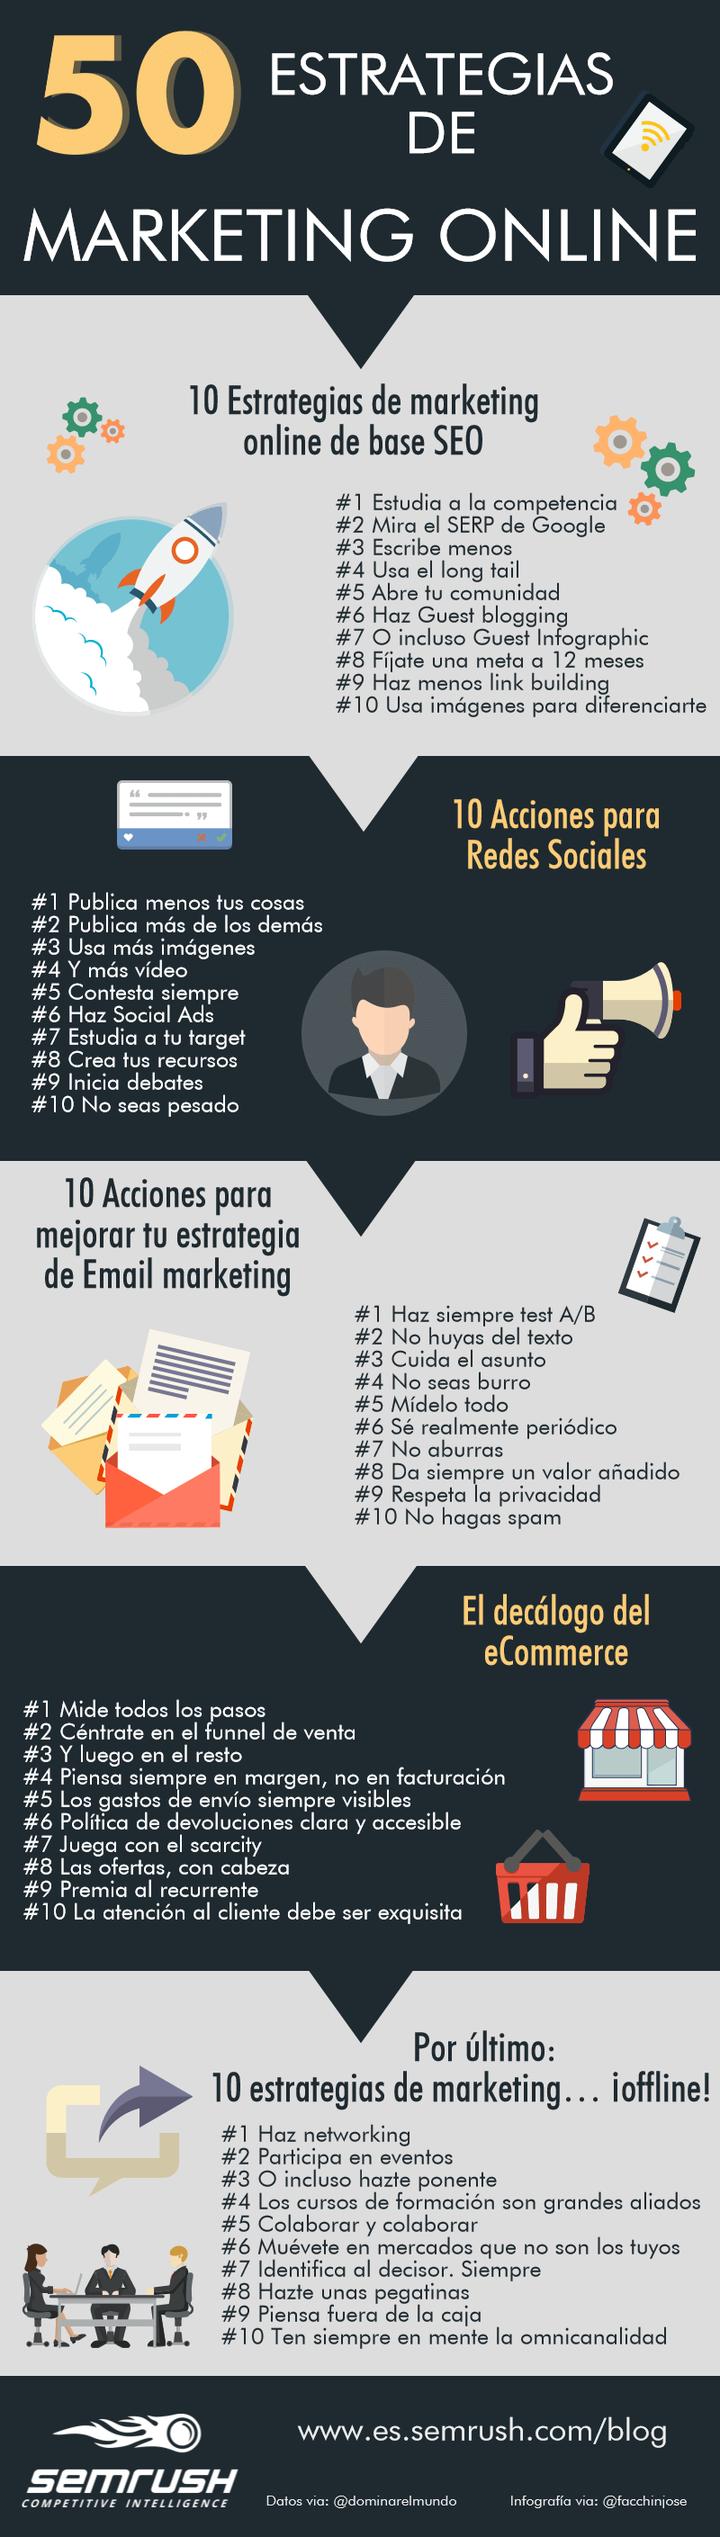 50 Estrategias de Marketing online